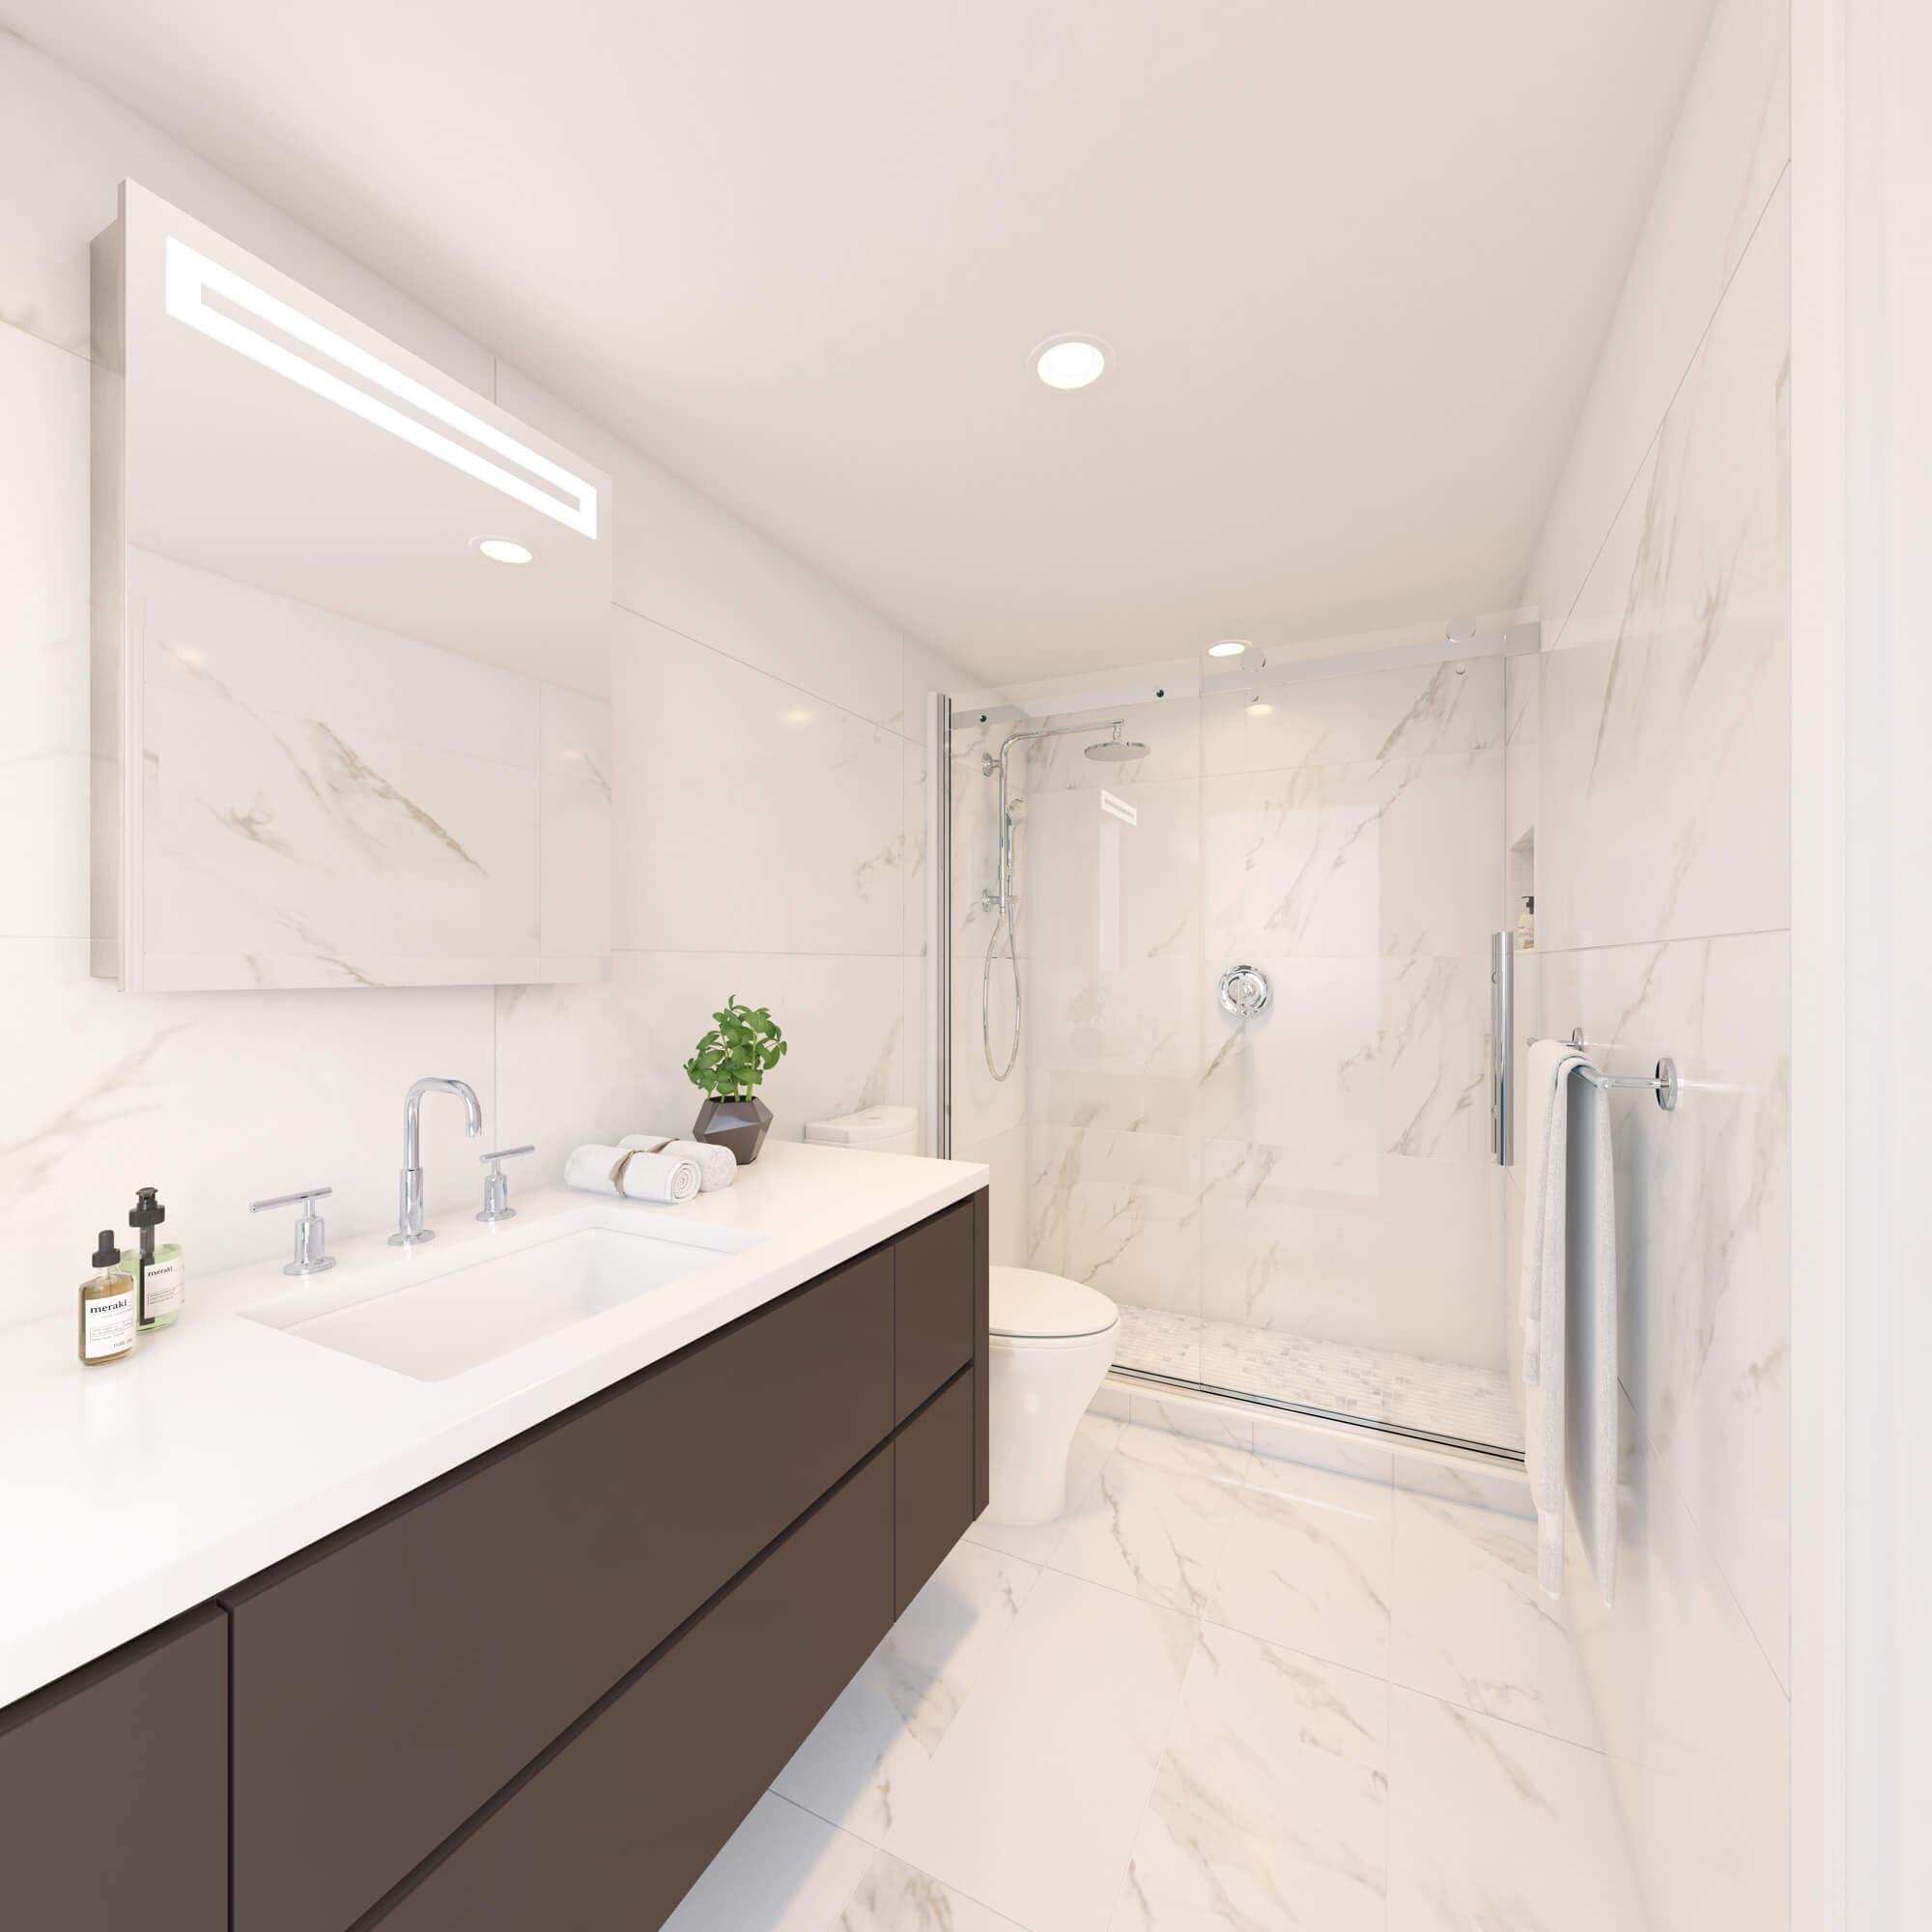 Bathroom - 2888 Arbutus St, Vancouver, BC V6J 3Y7, Canada!